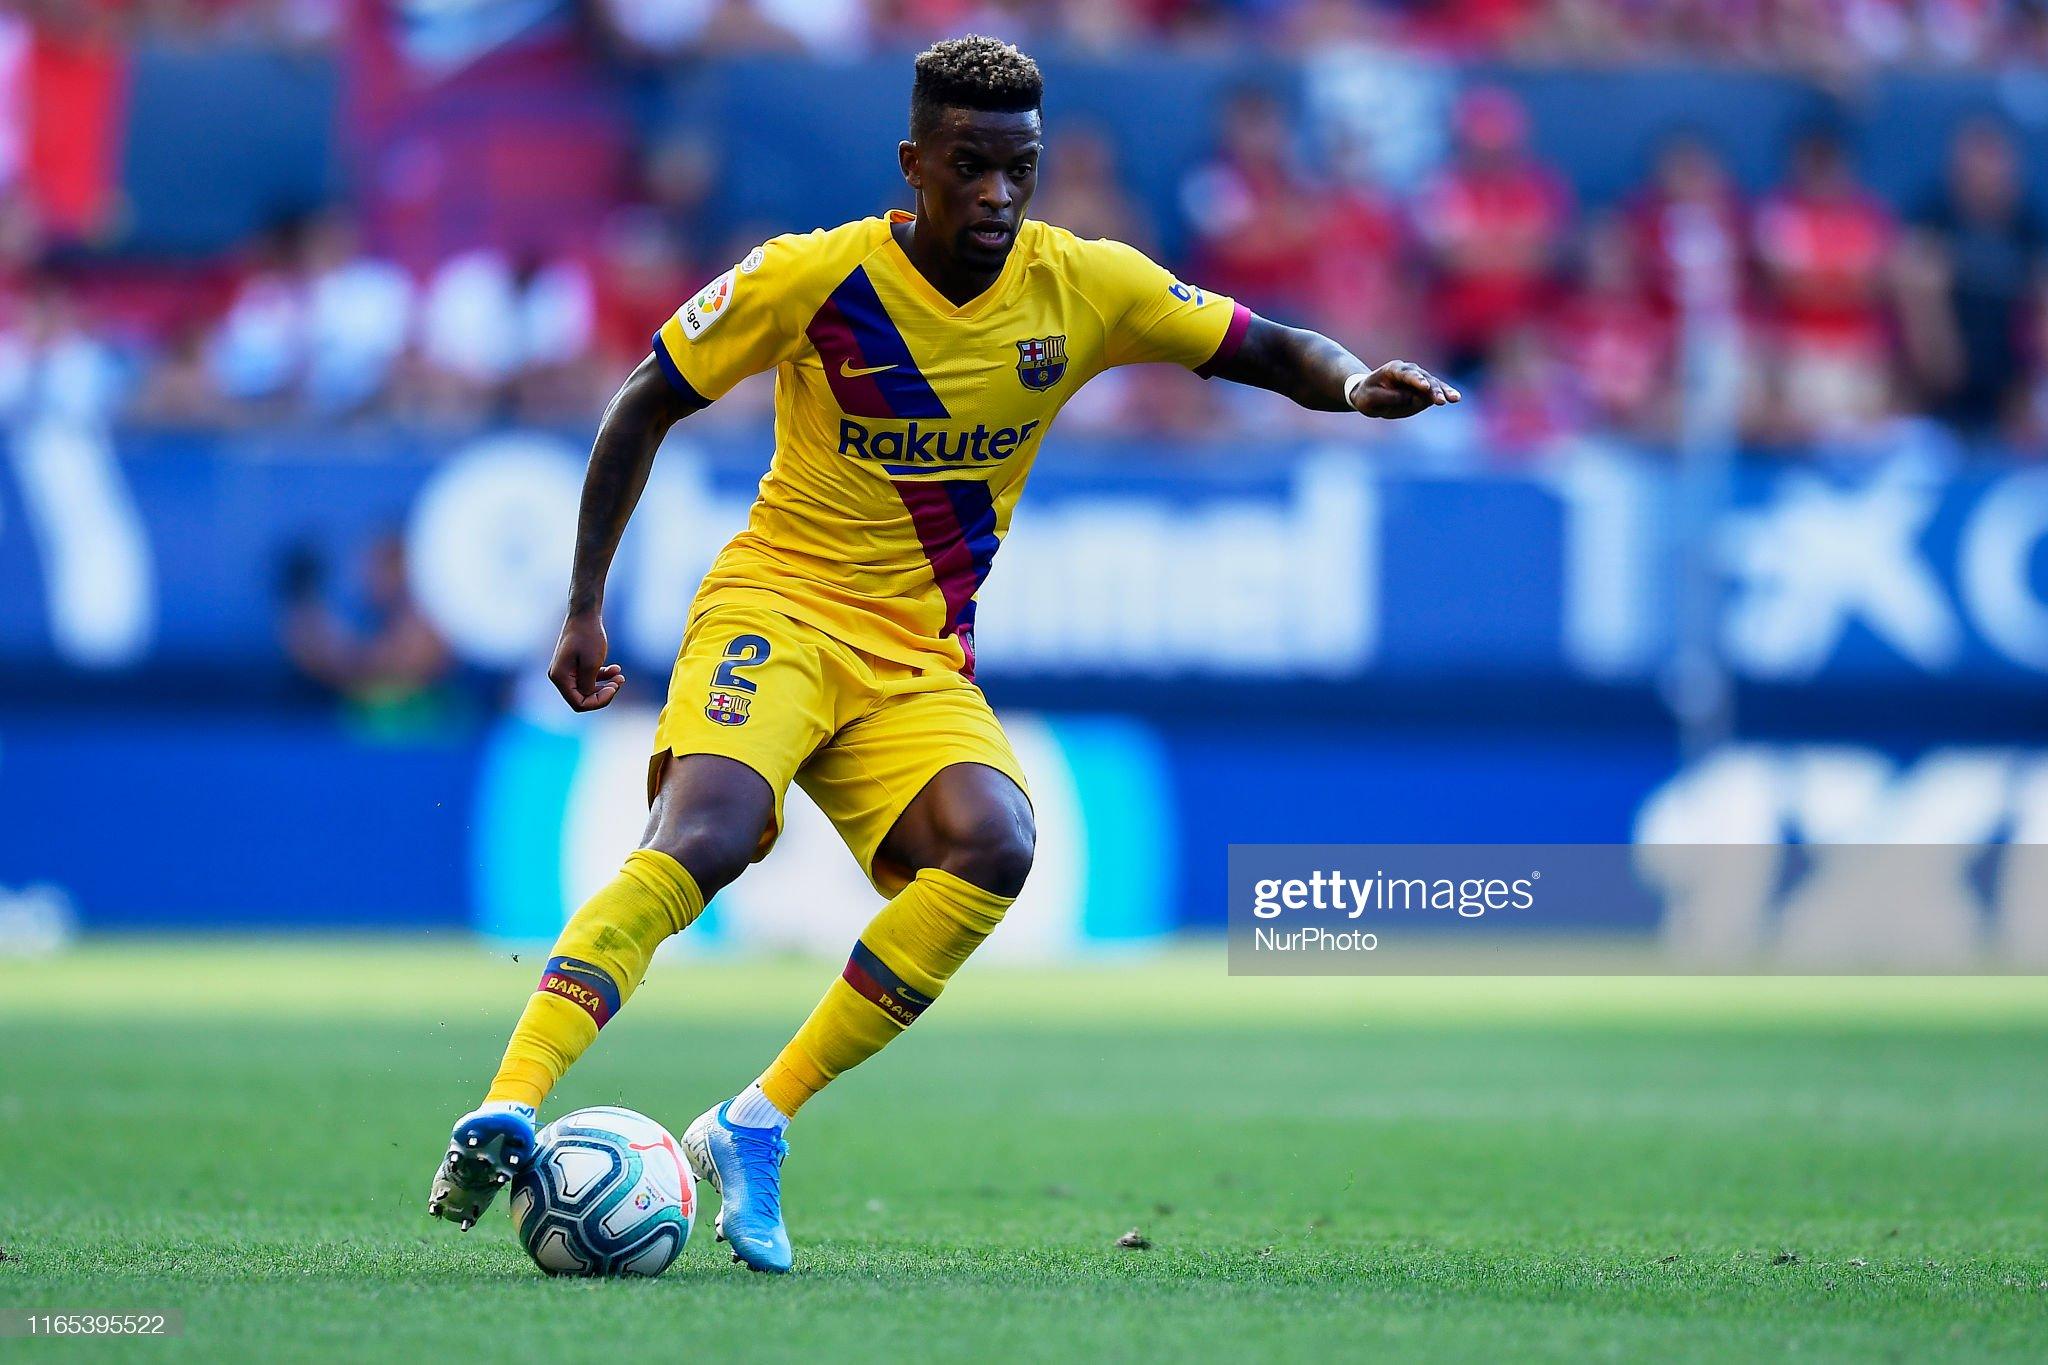 صور مباراة : أوساسونا - برشلونة 2-2 ( 31-08-2019 )  Nelson-semedo-of-barcelona-in-action-during-the-liga-match-between-ca-picture-id1165395522?s=2048x2048